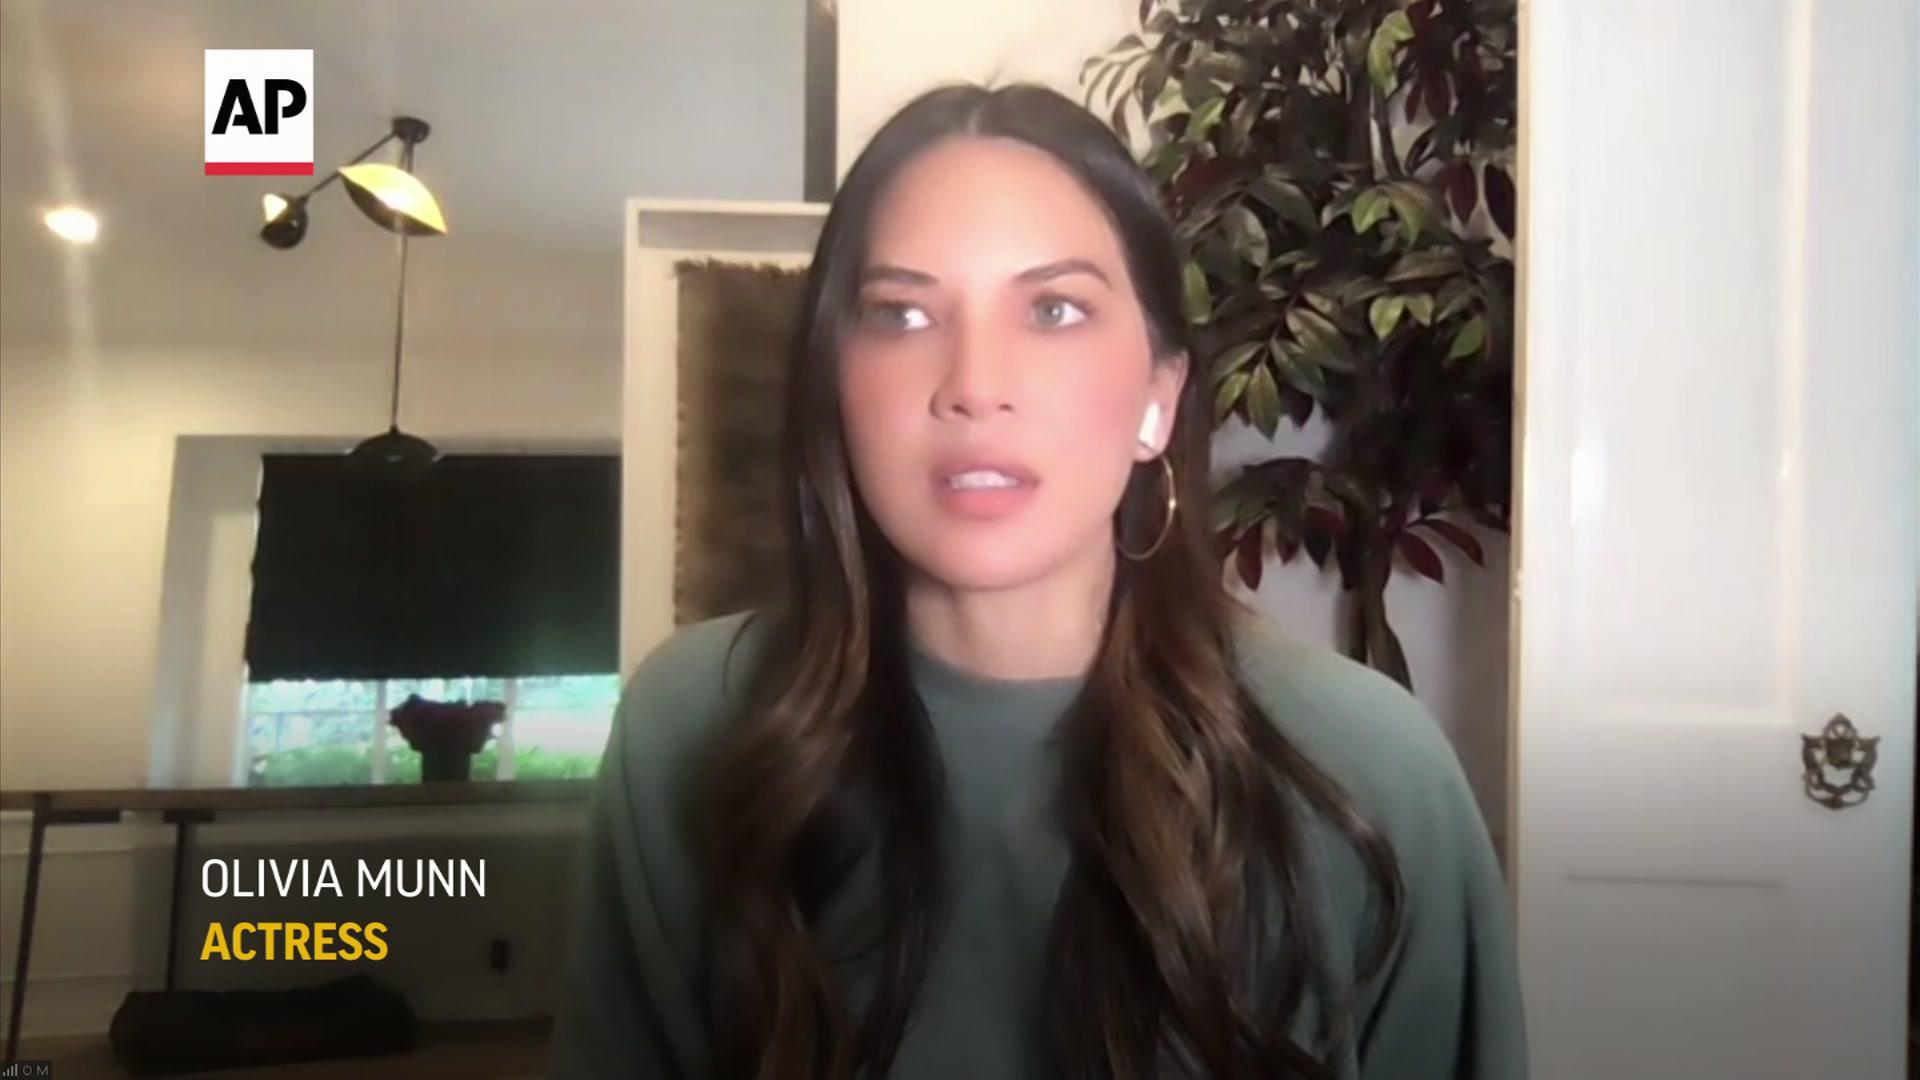 ca.news.yahoo.com: Actress spotlights crimes against Asian Americans